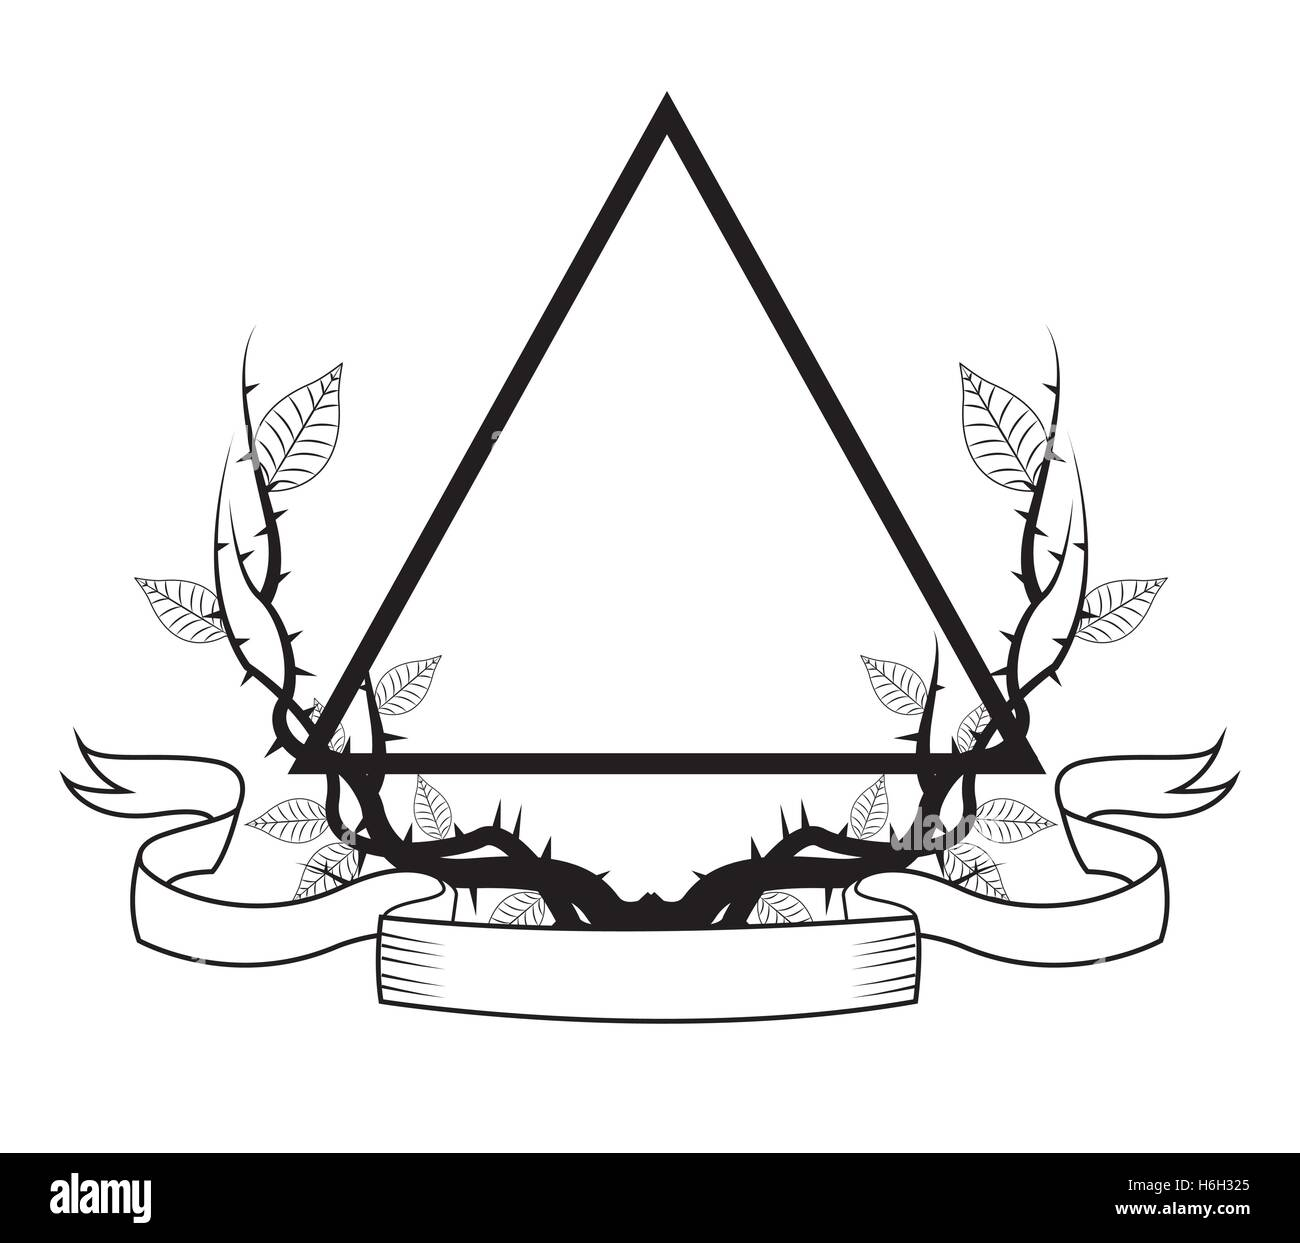 Triangle Tattoo Art Design Stock Vector Art Illustration Vector